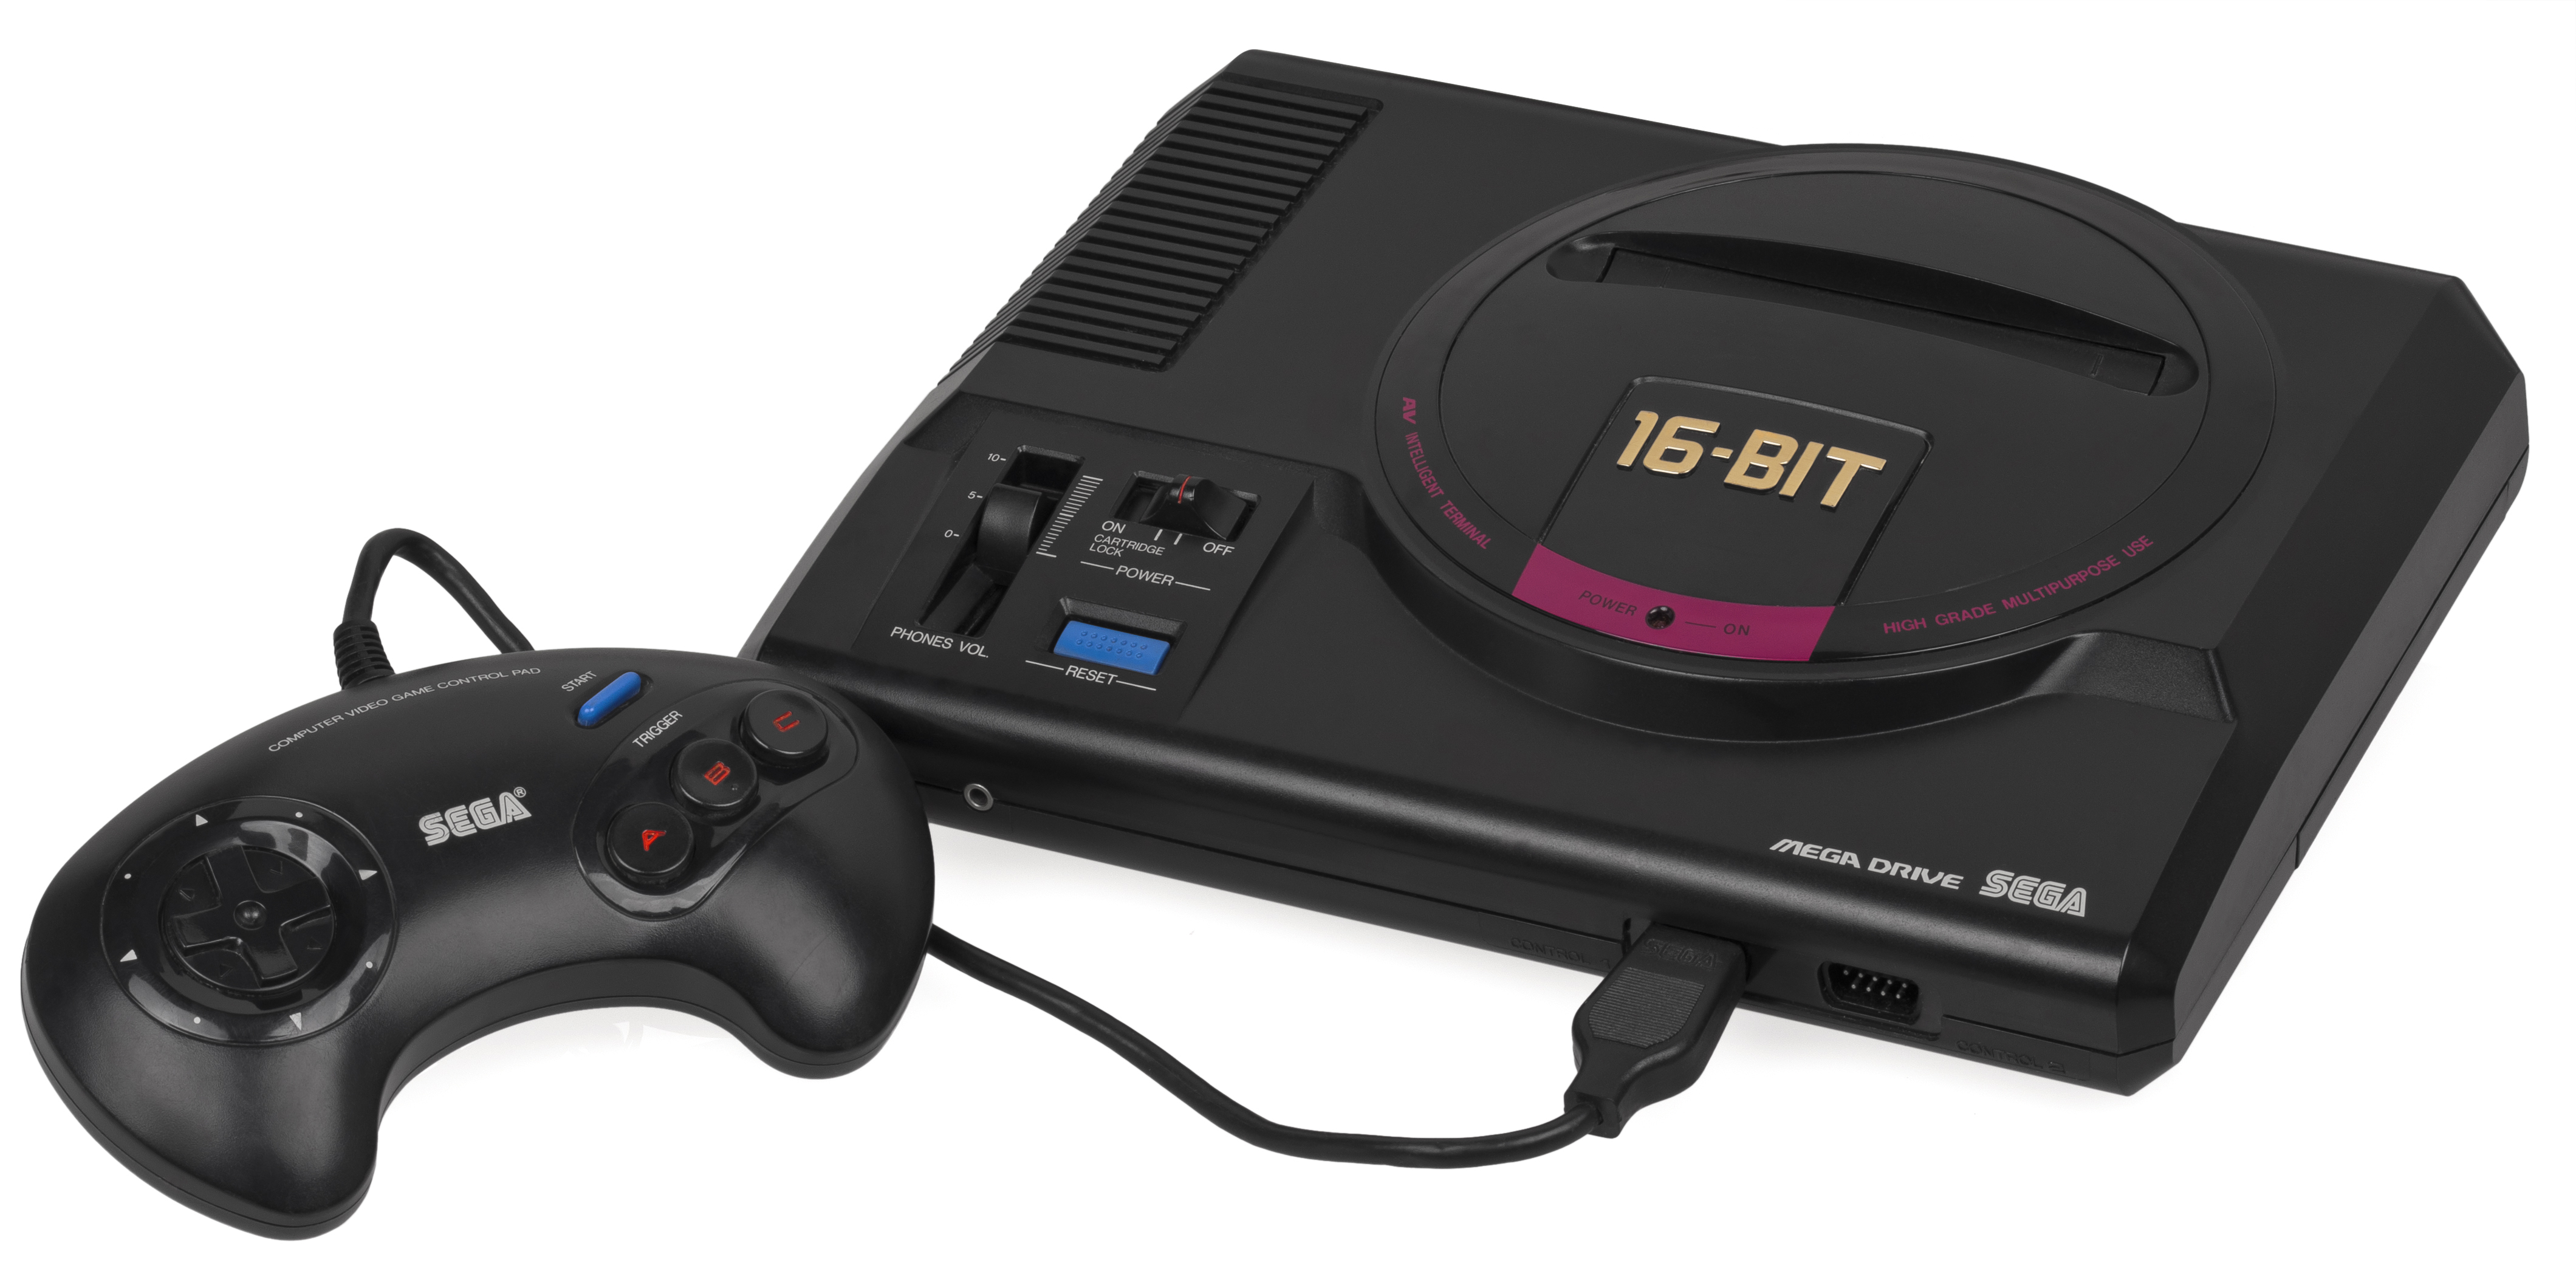 http://upload.wikimedia.org/wikipedia/commons/a/a1/Sega-Mega-Drive-JP-Mk1-Console-Set.jpg